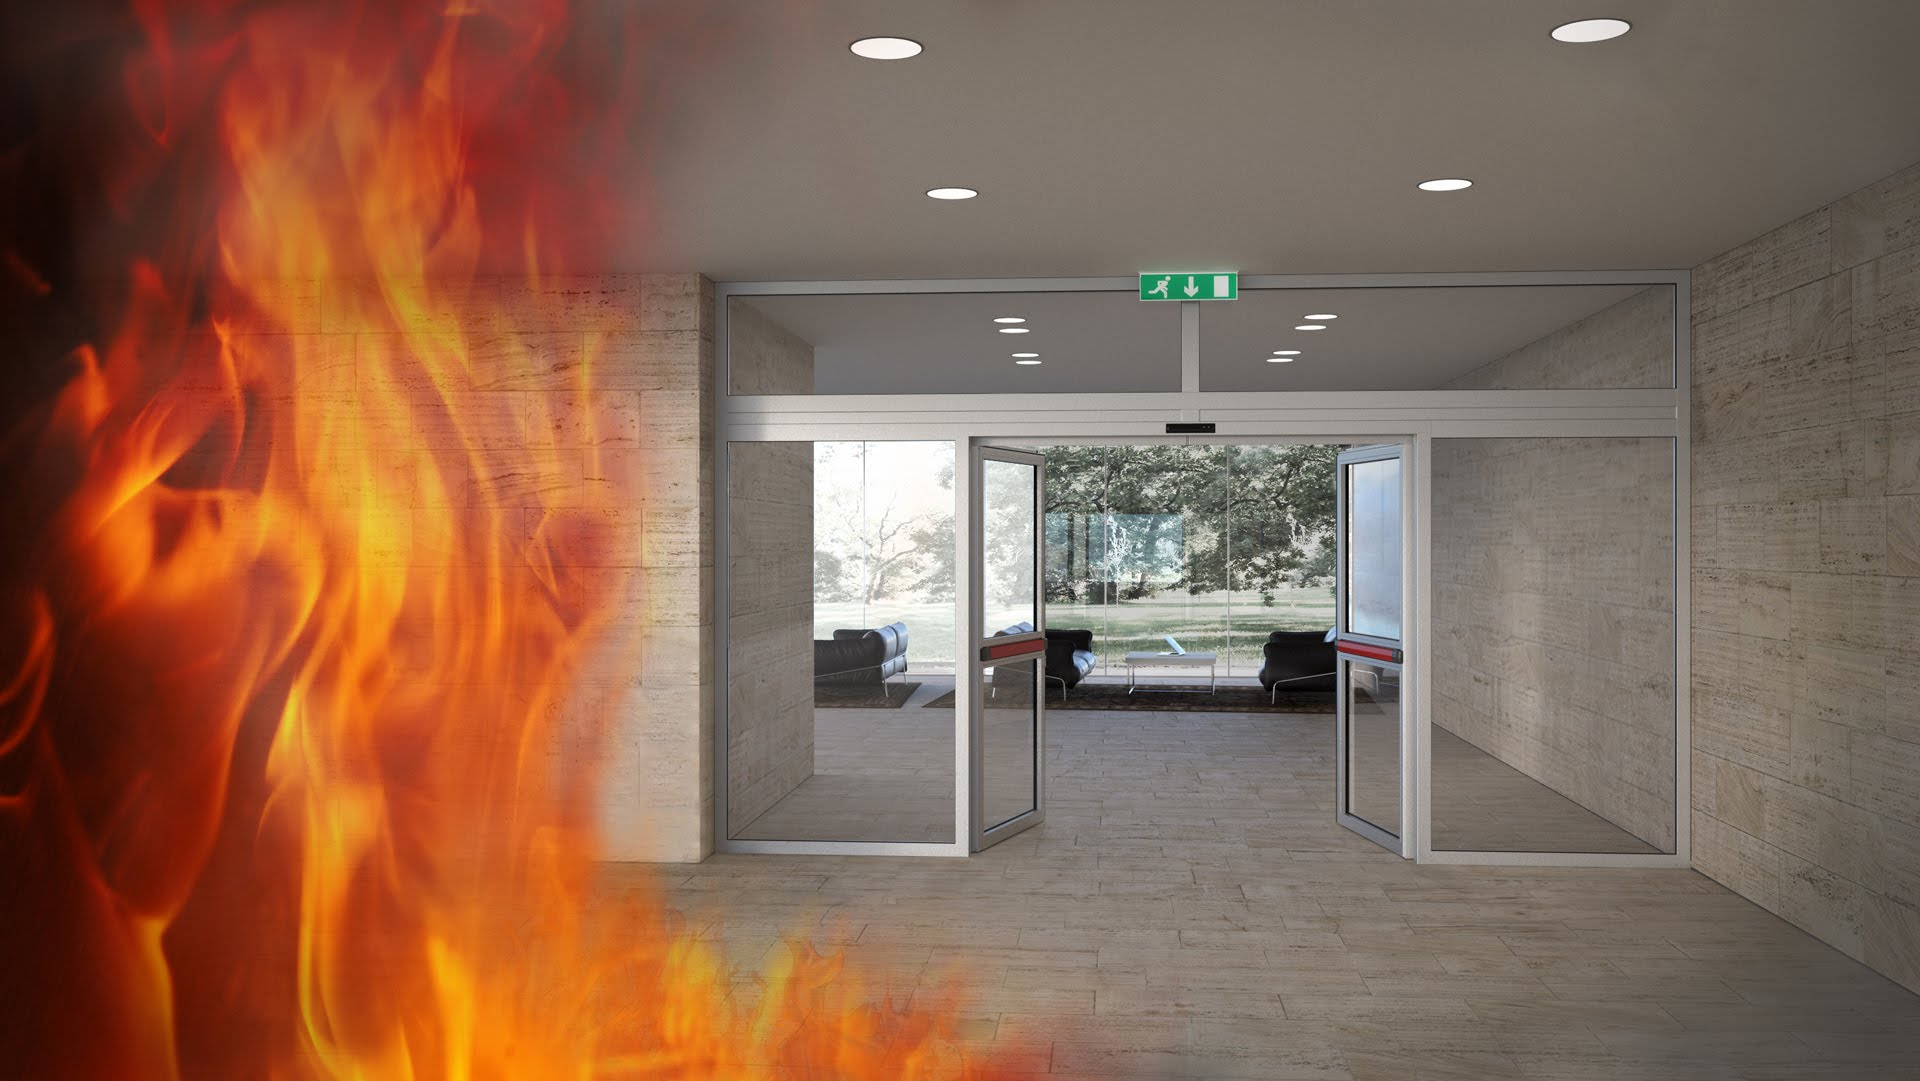 Arcom Glass partenerul dumneavoastra in usi automate rezistente la foc